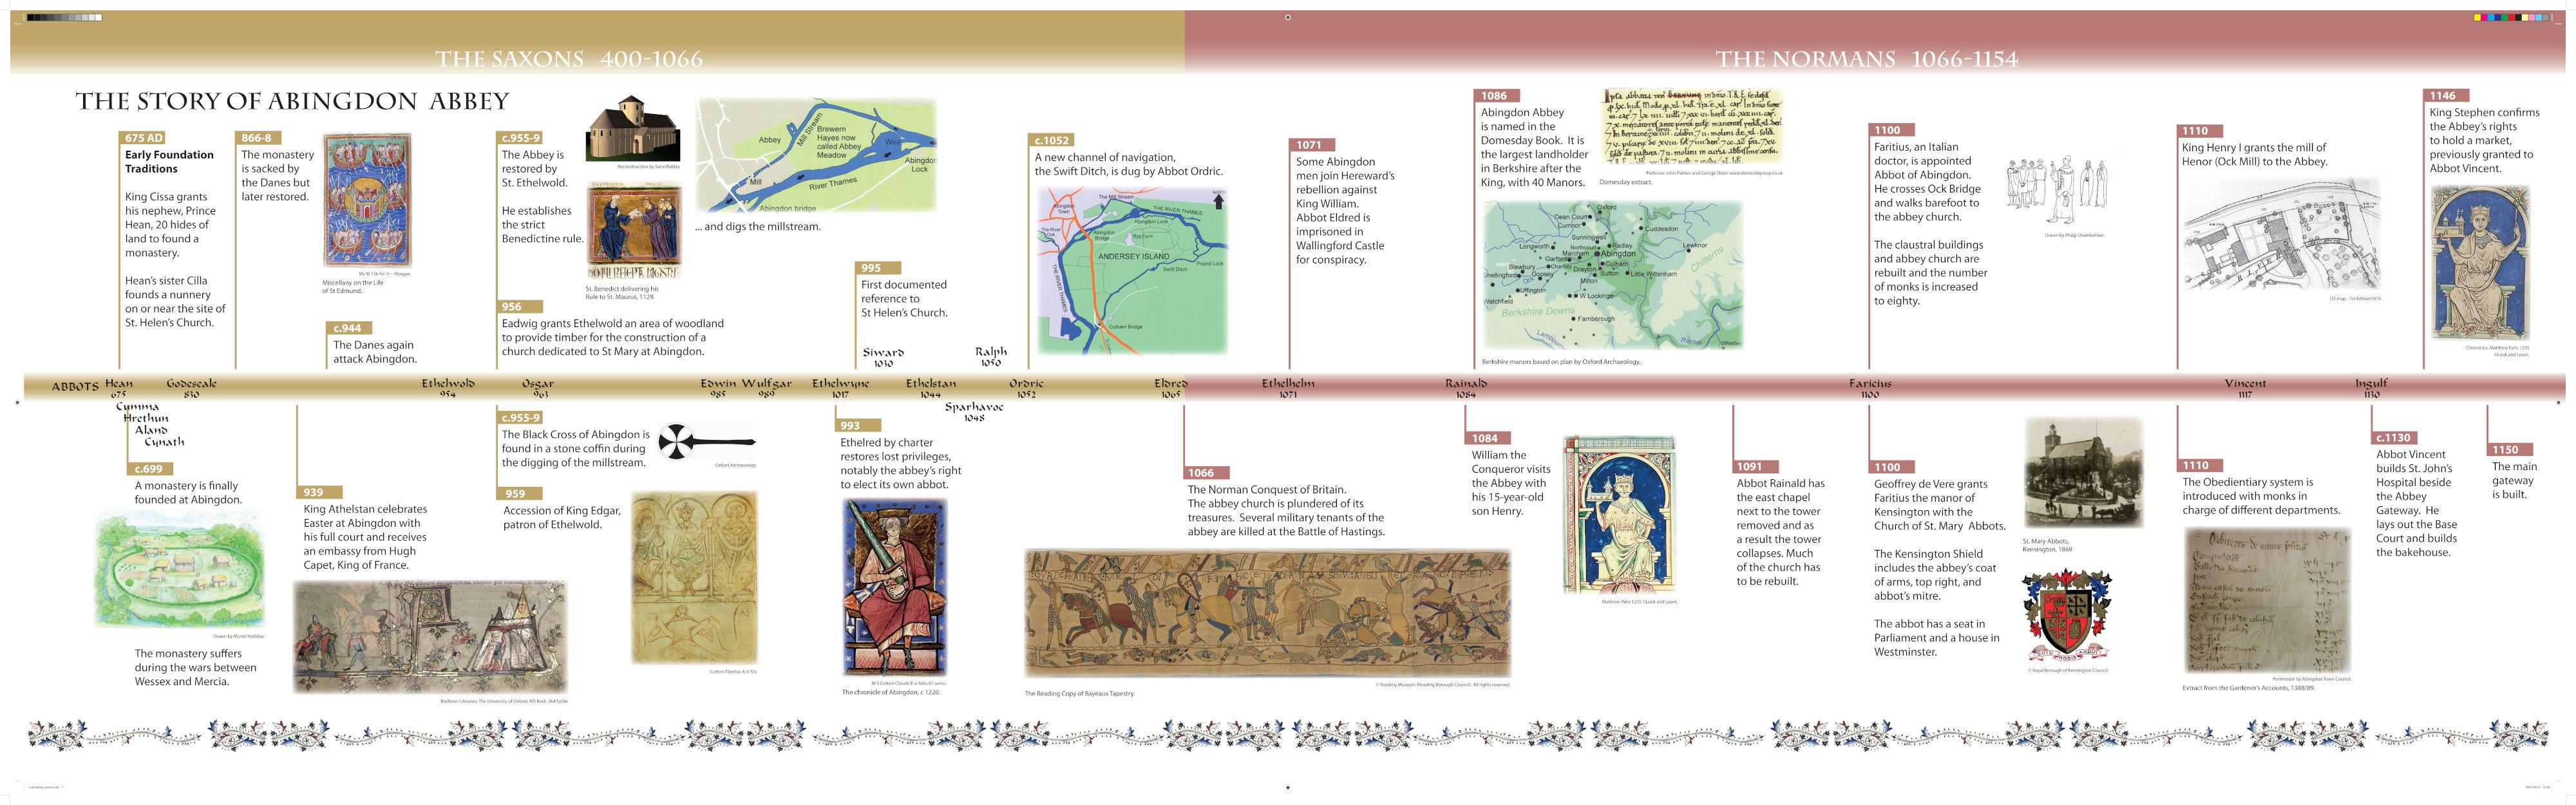 Abingdon Abbey Timeline 1